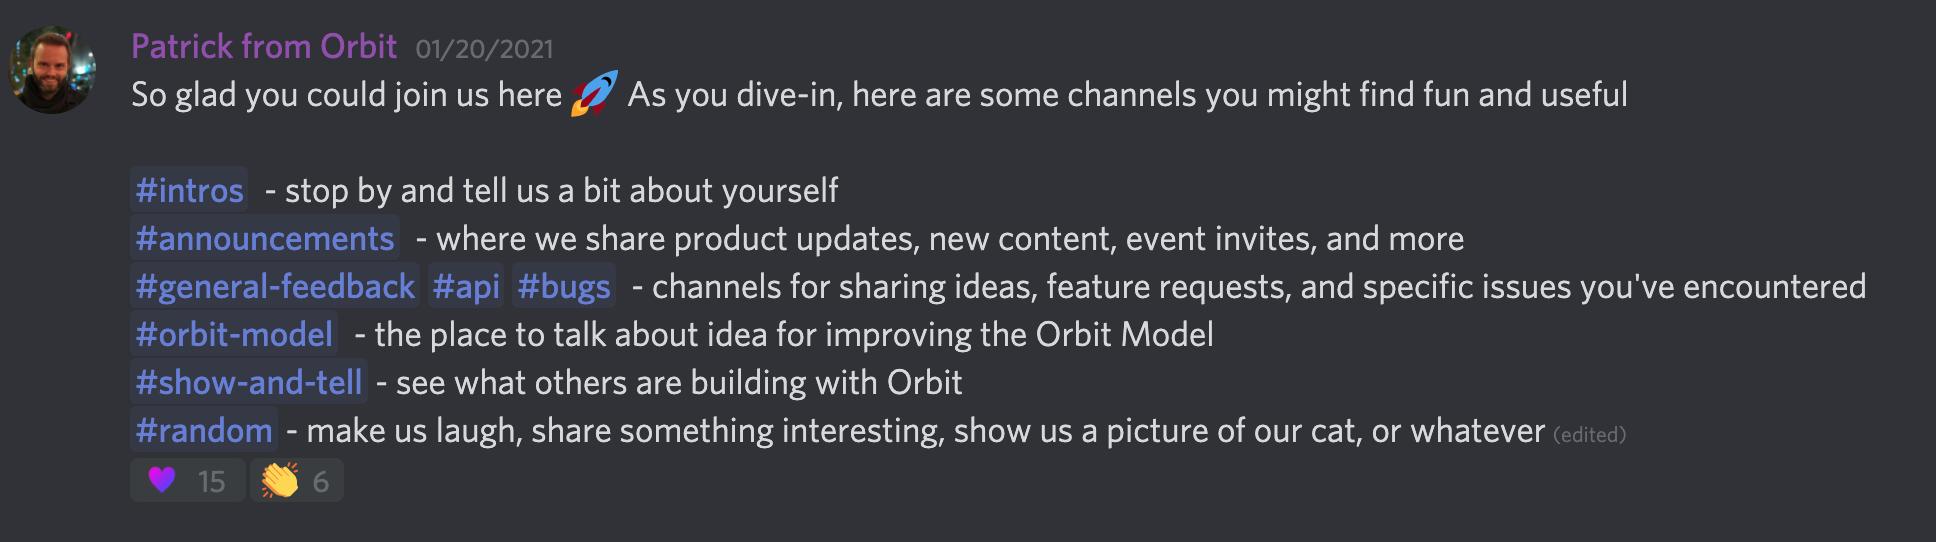 Screenshot of the Orbit Discord server welcome message